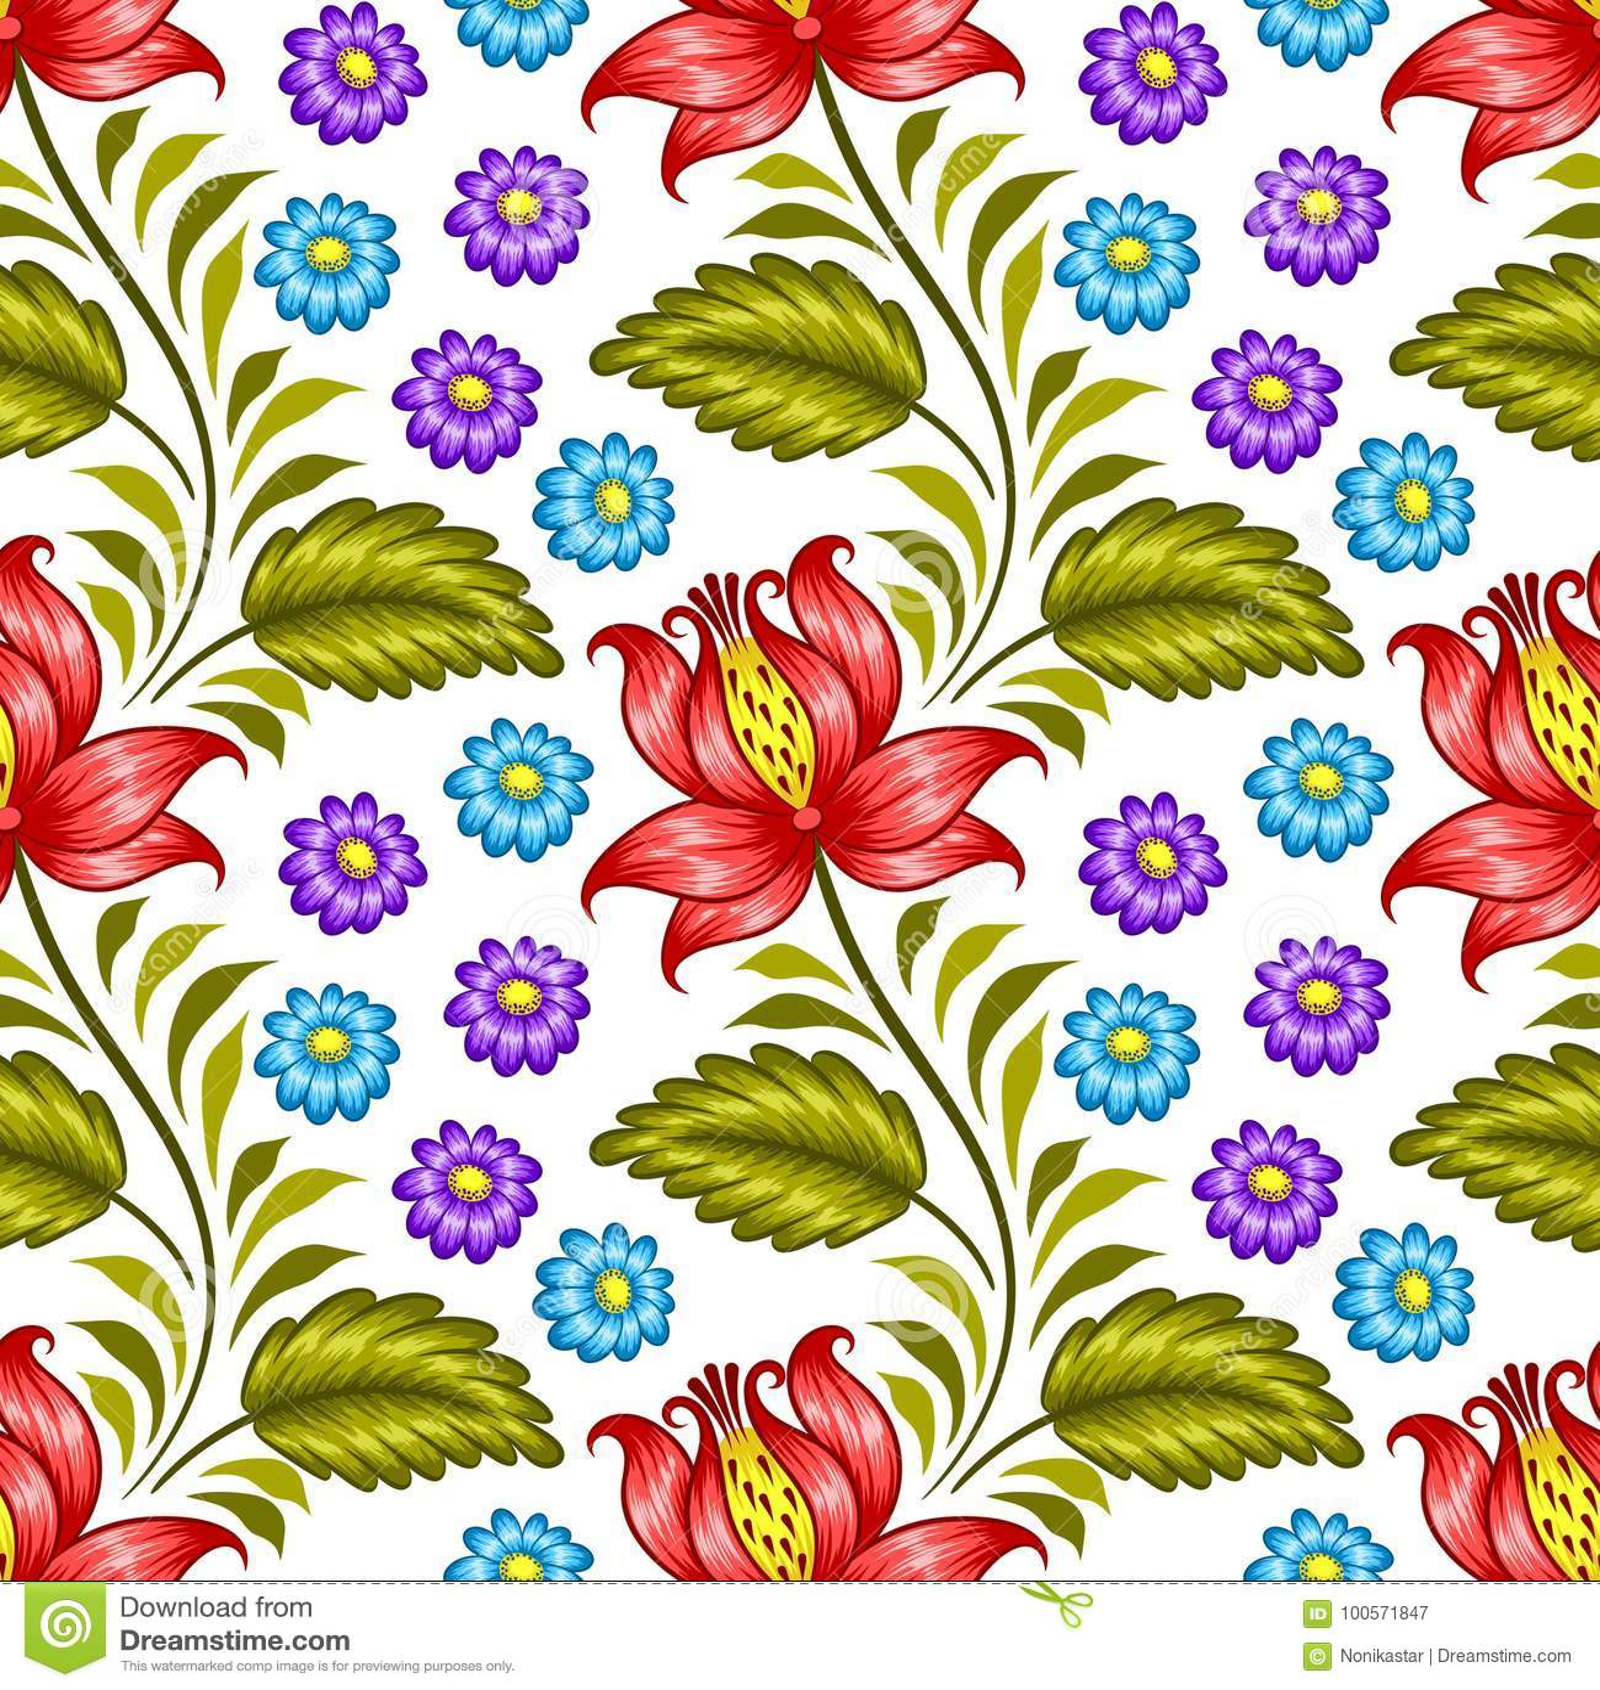 Ukrainian floral pattern